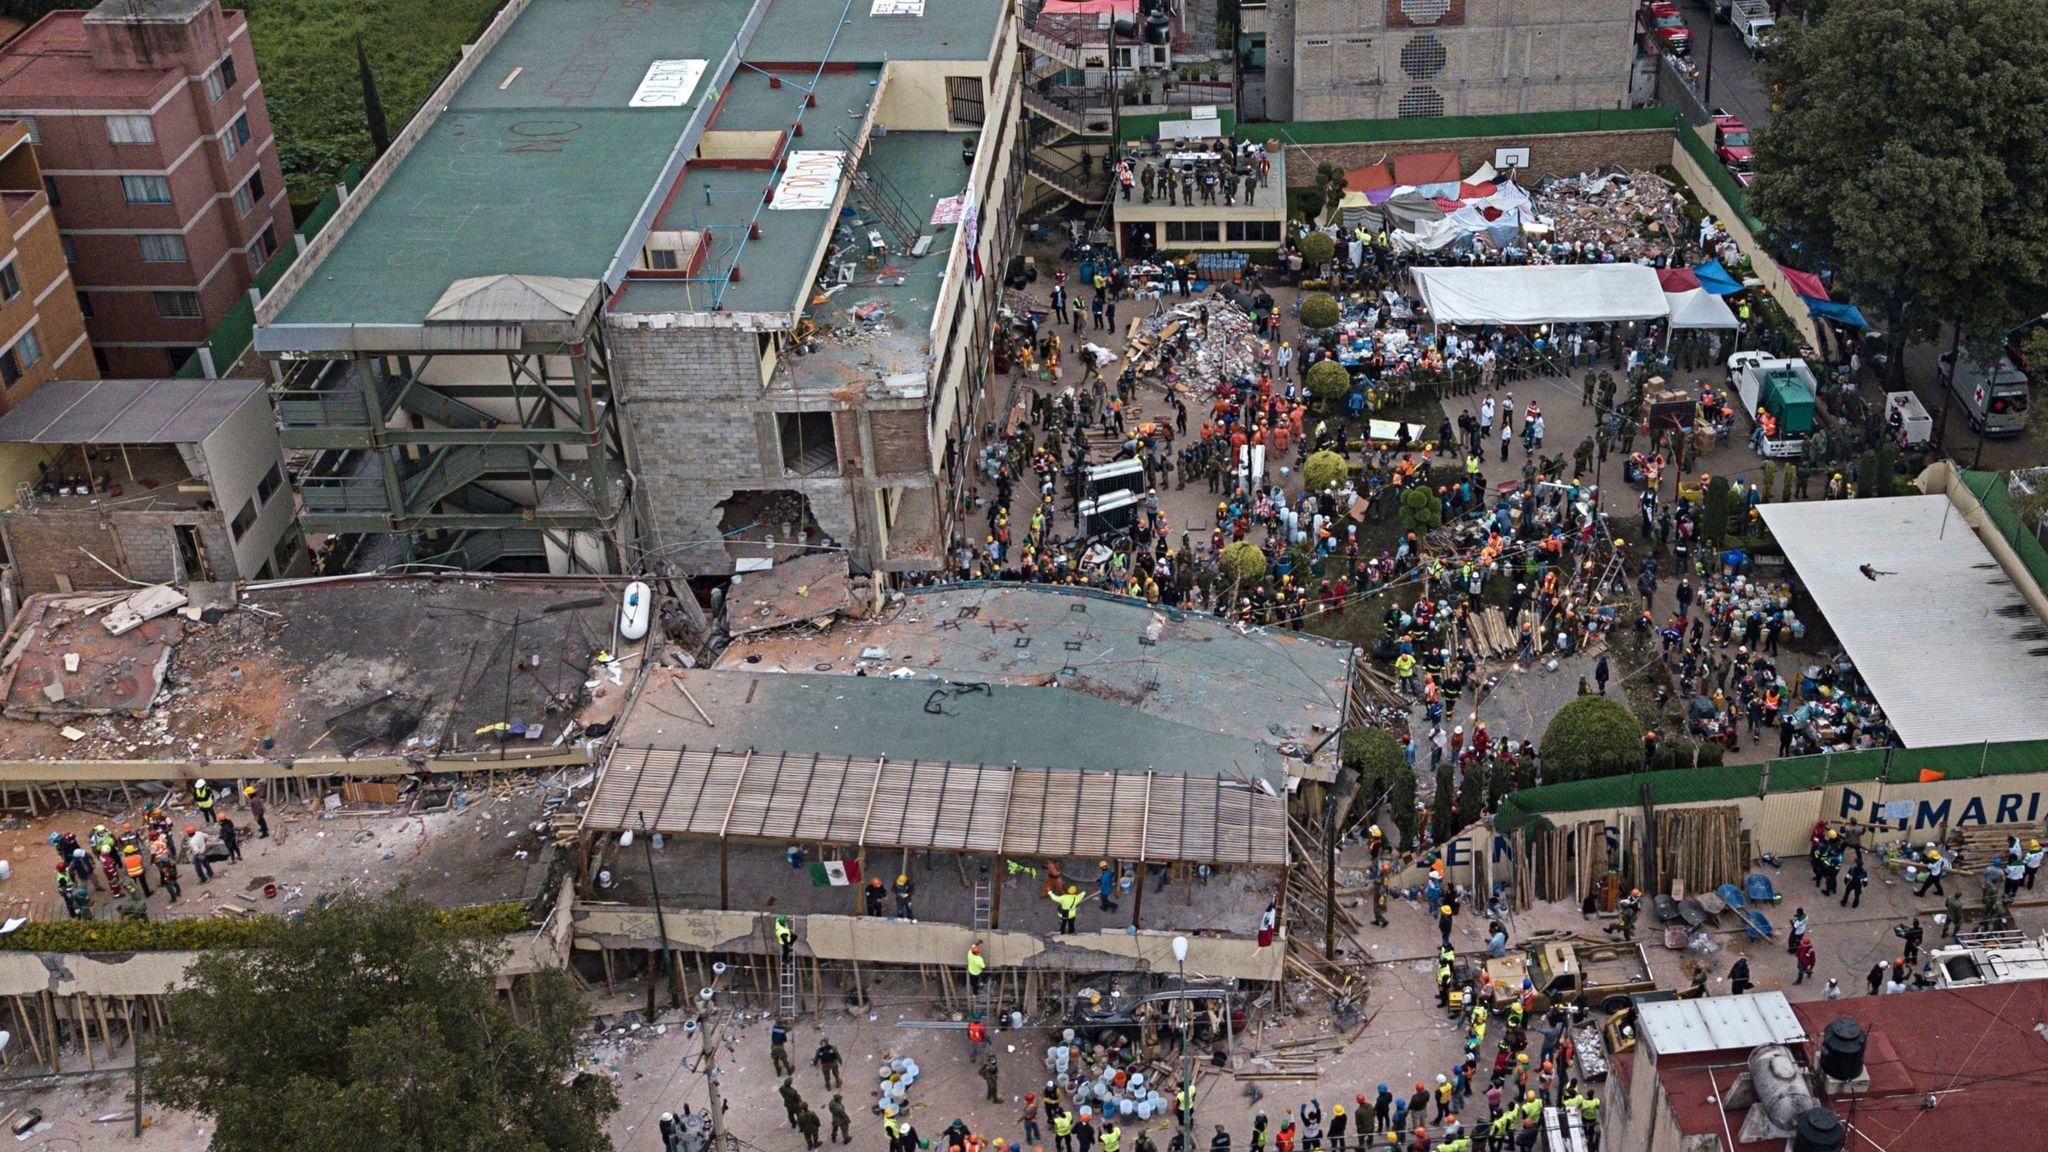 http://www.latimes.com/world/la-fg-mexico-earthquake-20170919-story.html